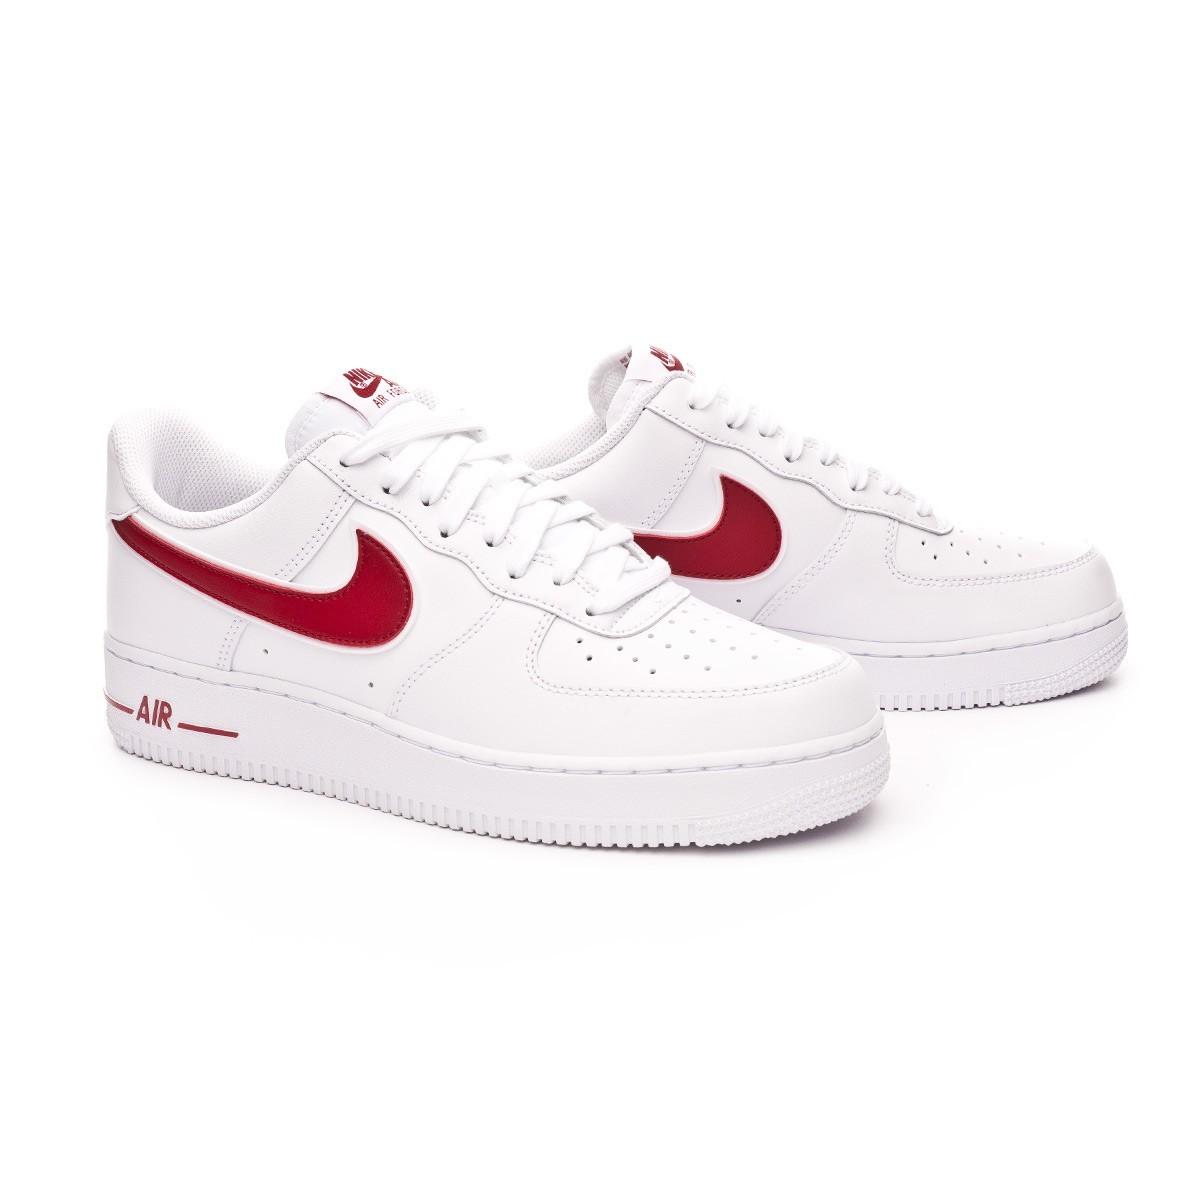 Nike Air Force 1 Red Swoosh